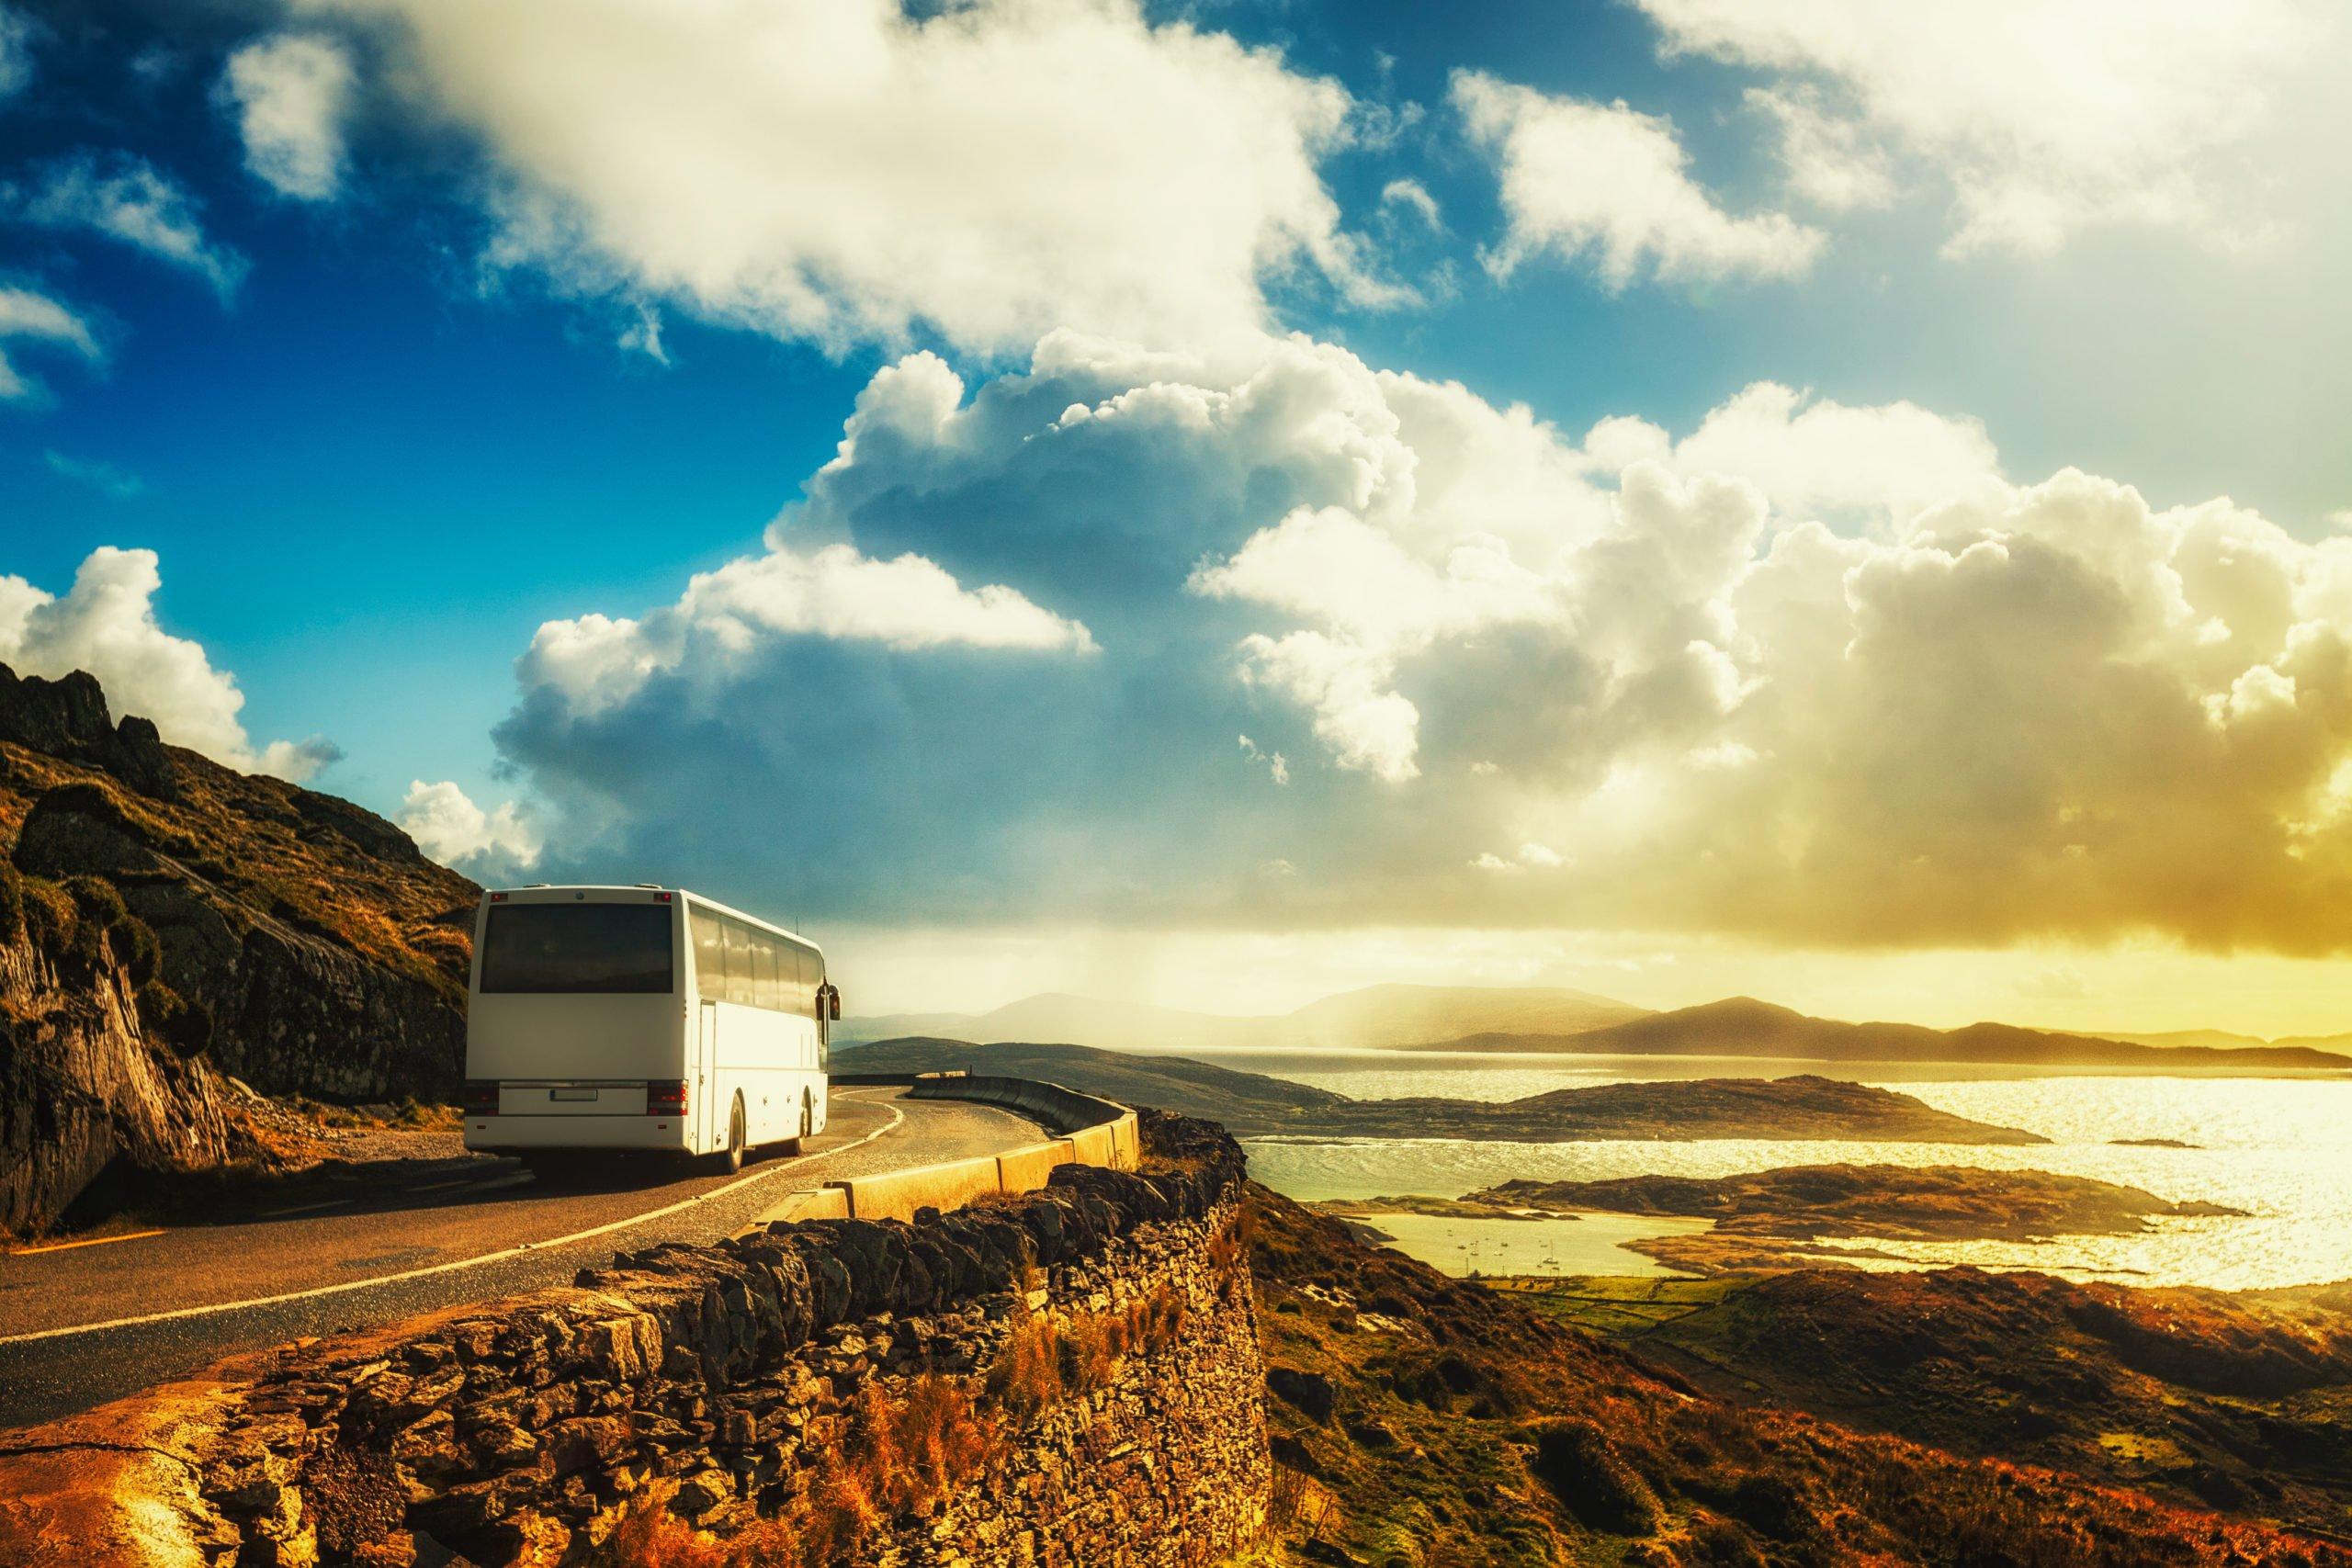 Kerry by Flixbus